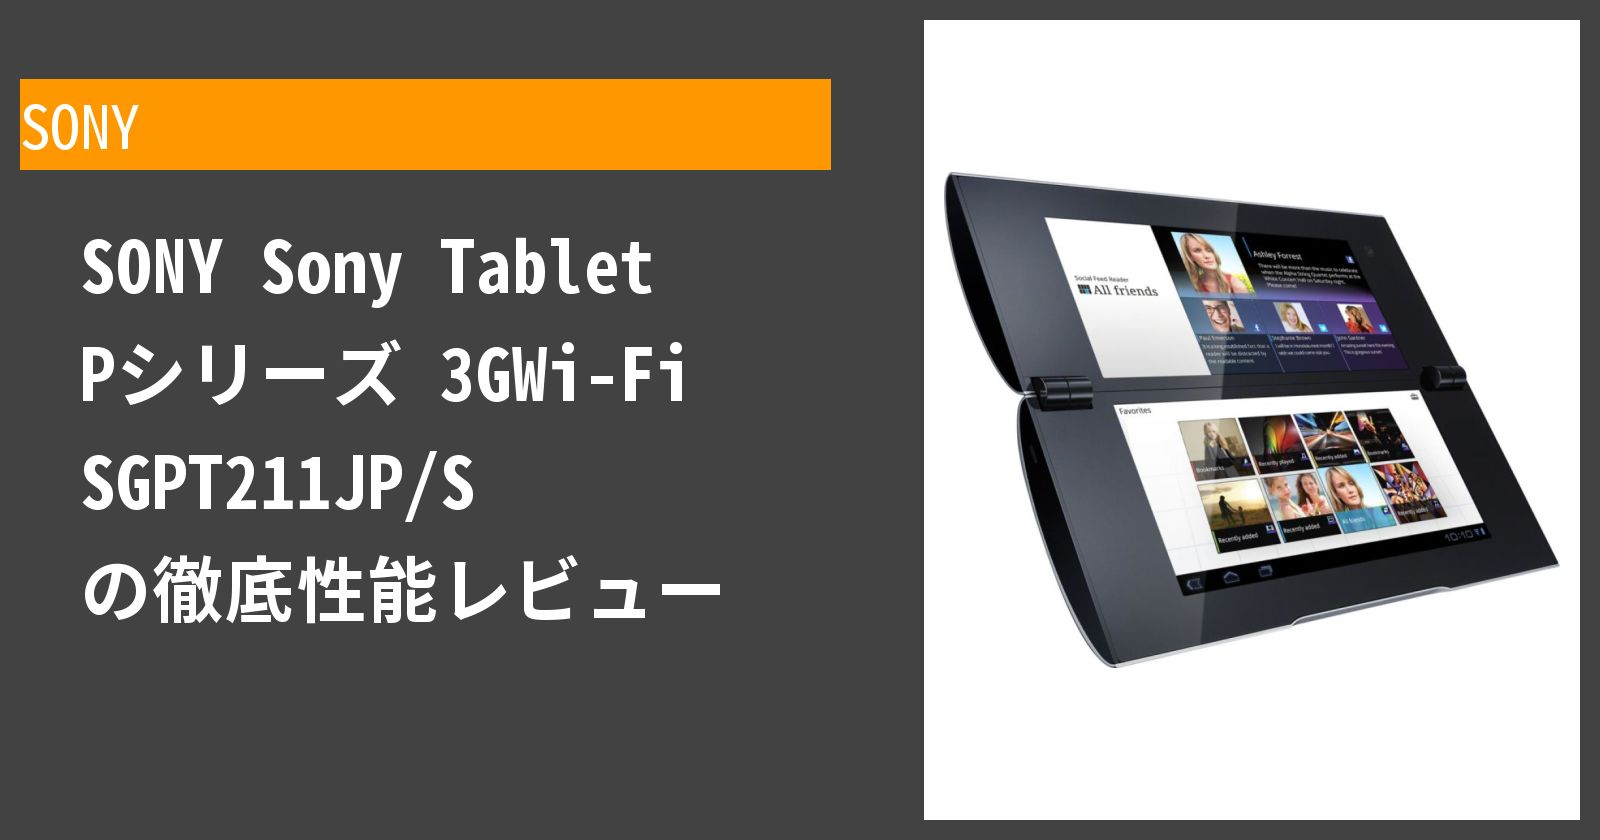 Sony Tablet Pシリーズ 3GWi-Fi SGPT211JP/S の徹底性能レビュー